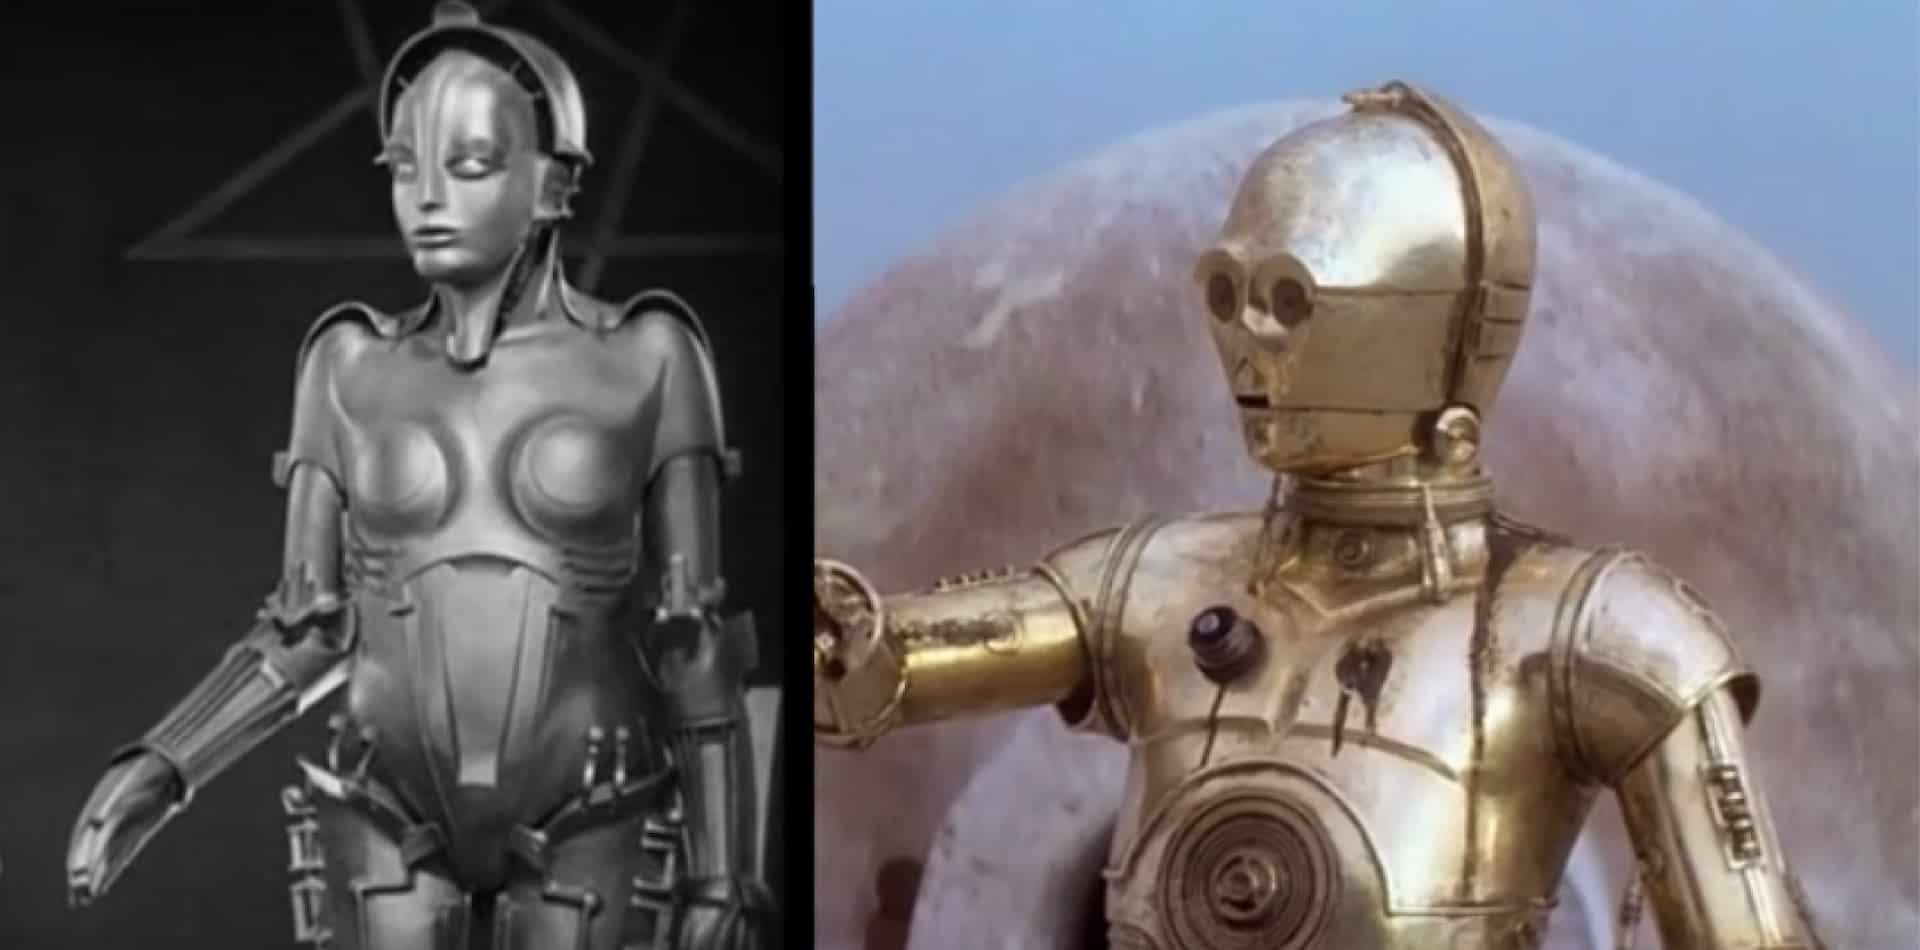 George Lucas cinemaotgraphe.it